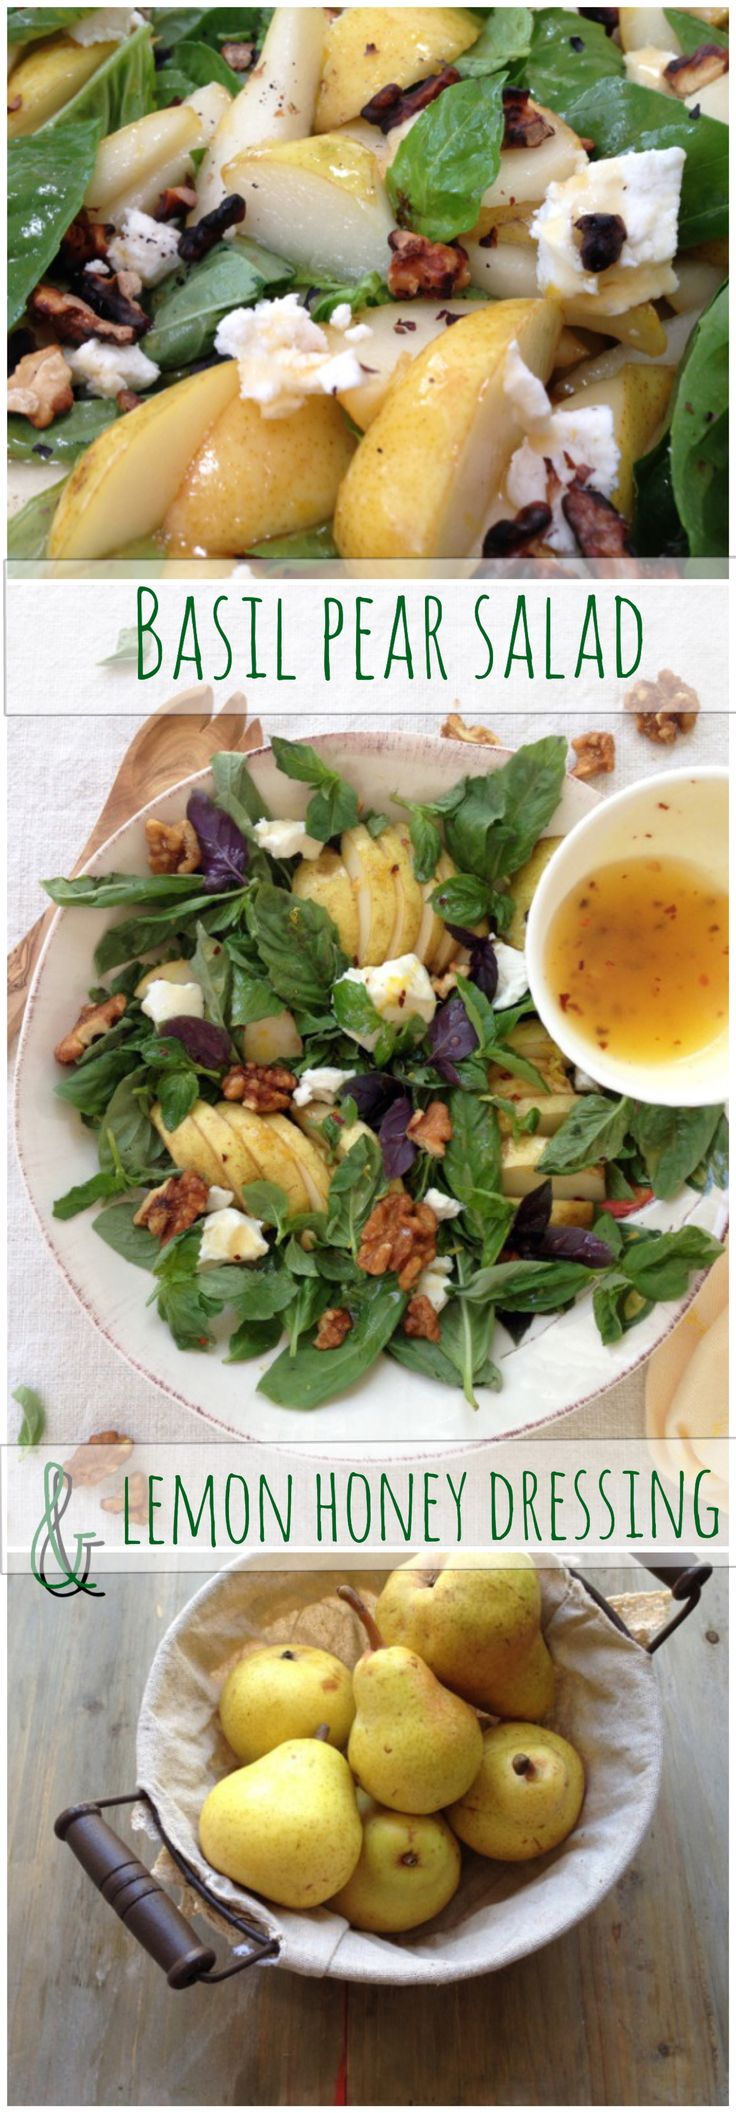 Basil Pear Salad with Goat Cheese & Walnuts in Honey Lemon Dressing  | CiaoFlorentina.com @CiaoFlorentina #Pear #Basil #Lemon